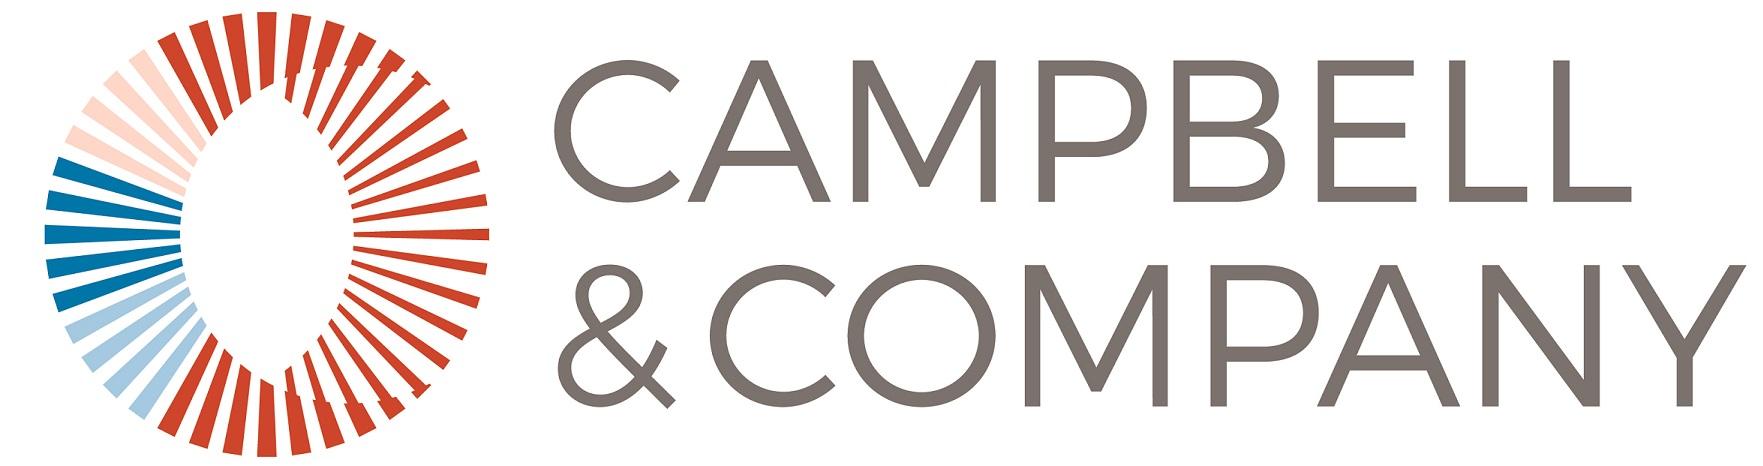 Campbell Company - Silver Sponsor Logo